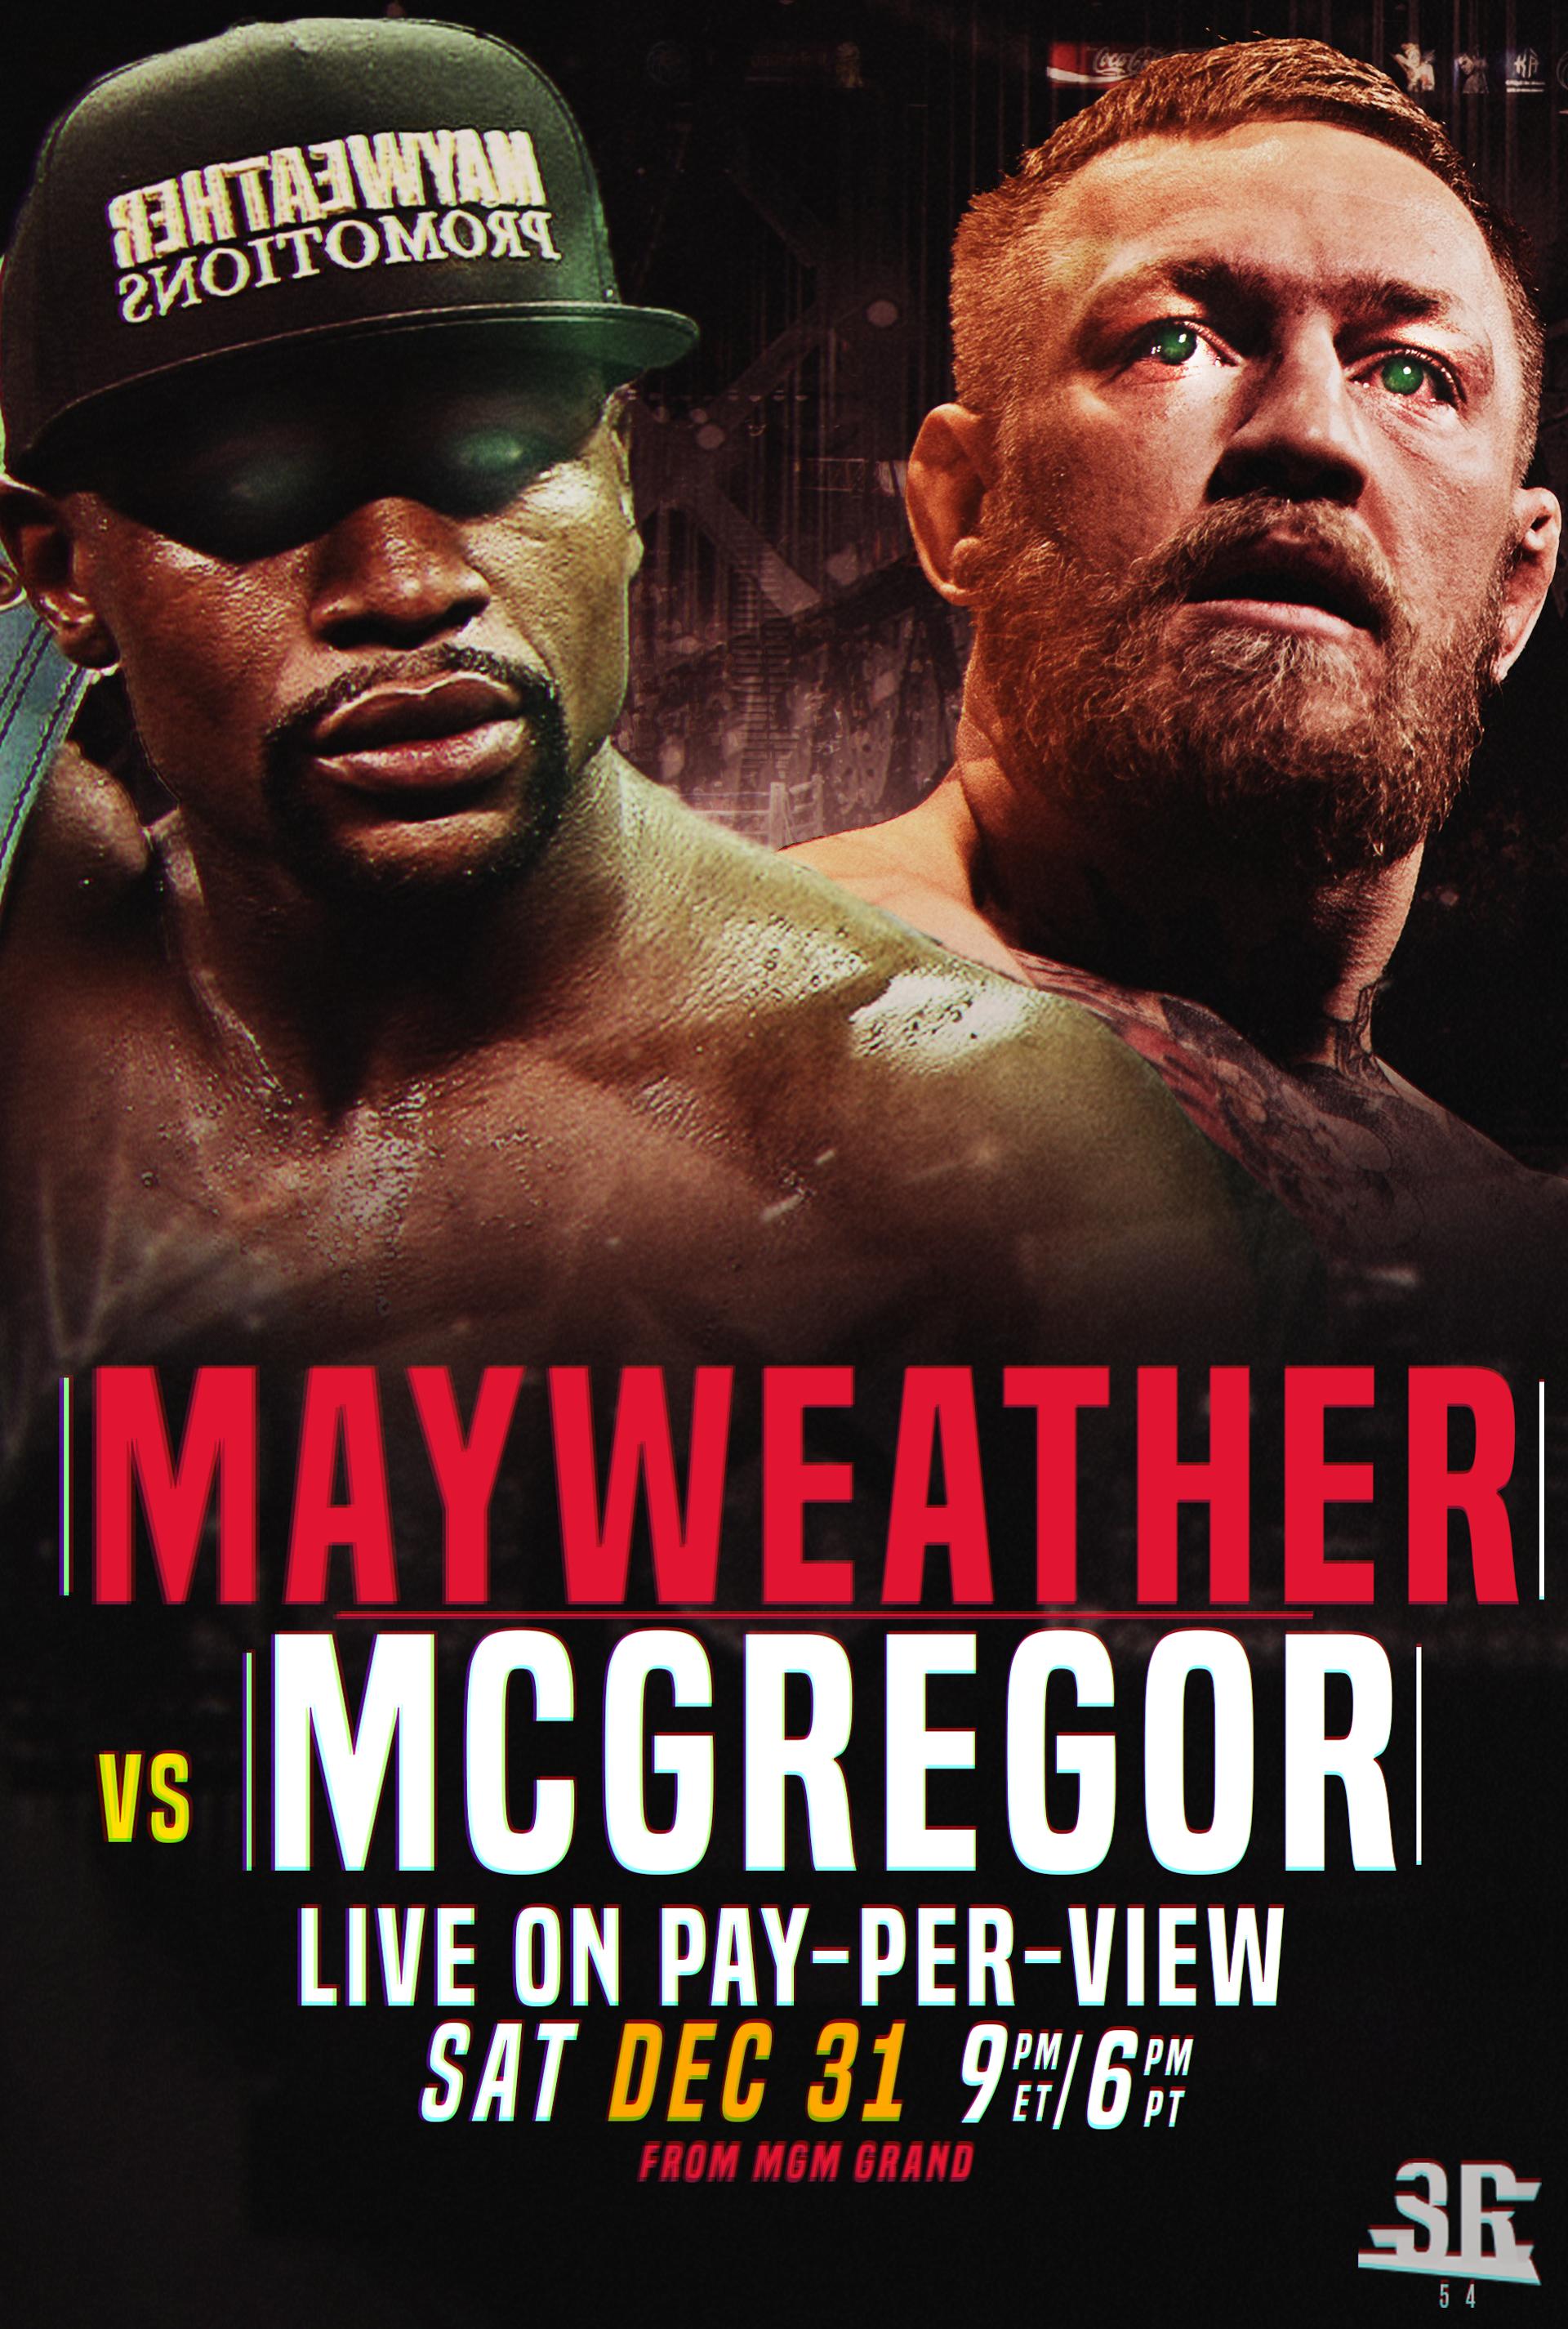 conor mcgregor vs floyd mayweather uhr